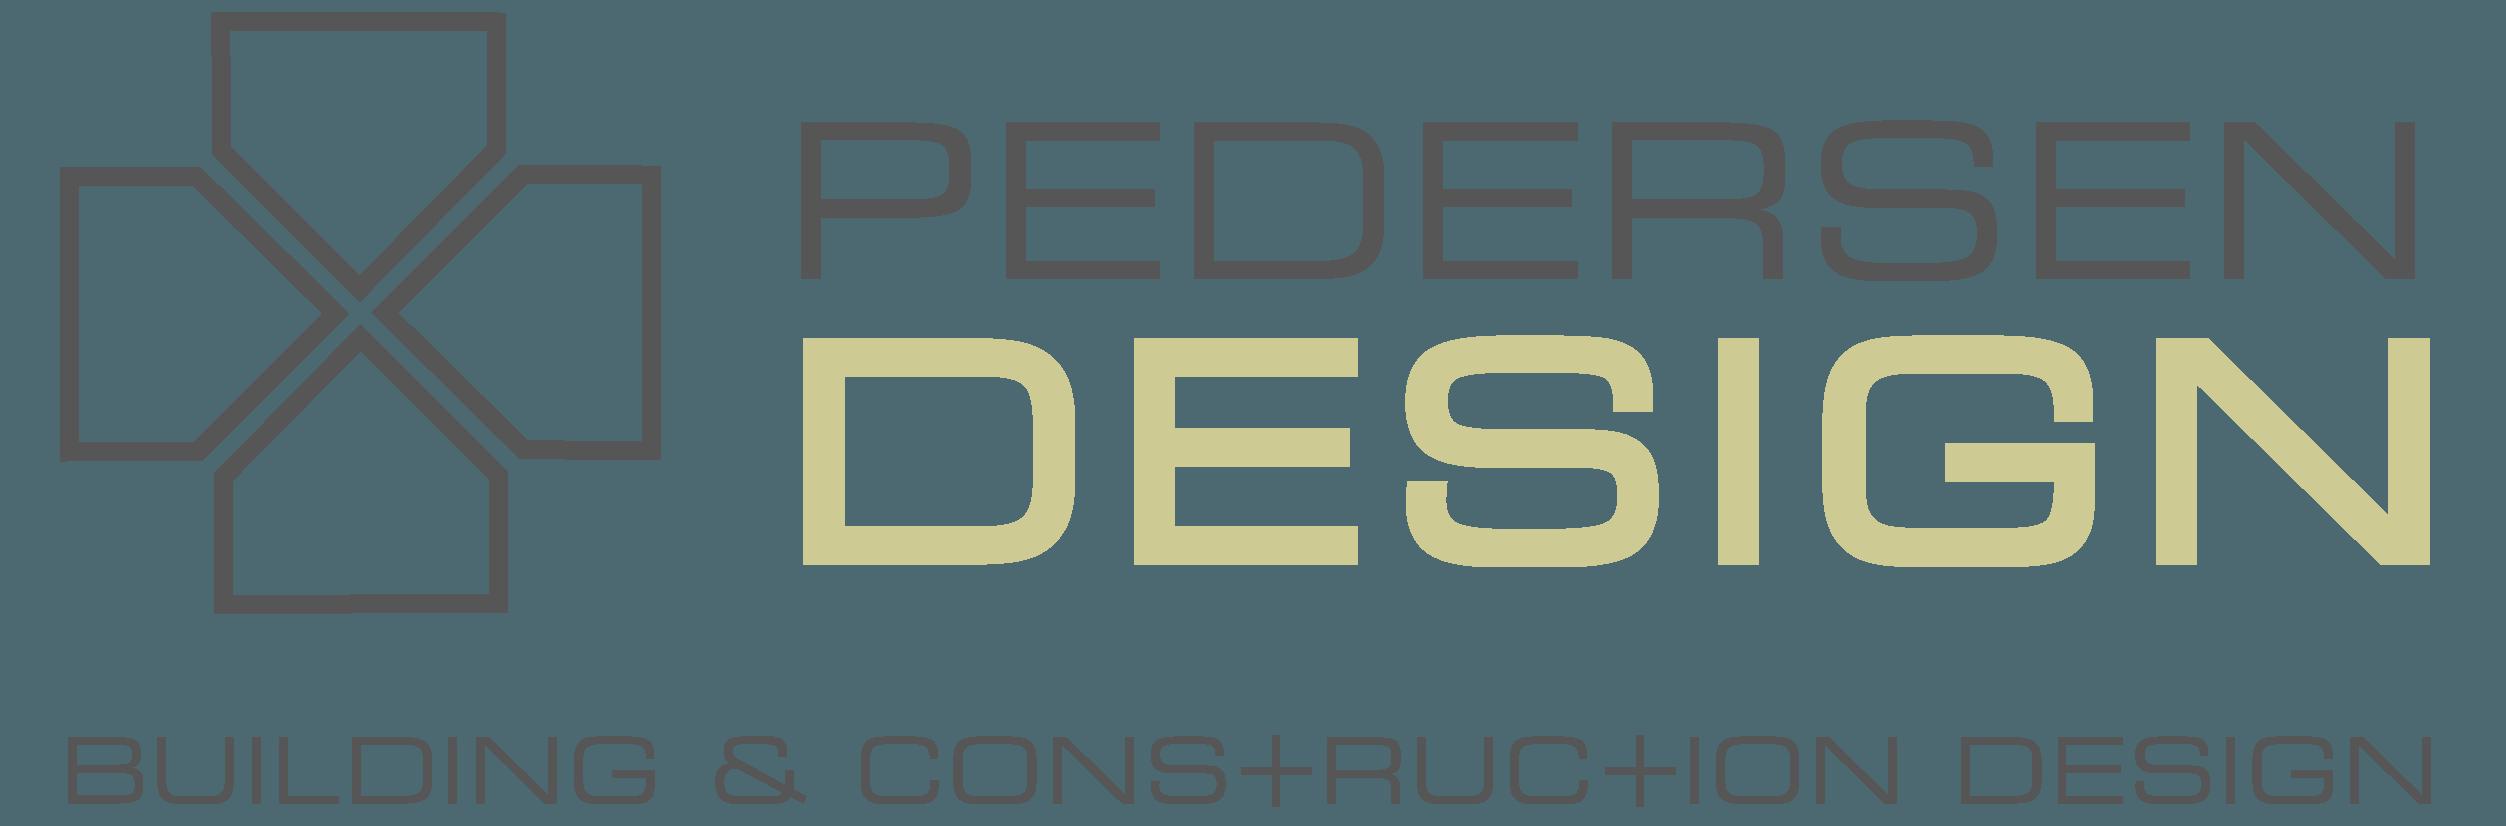 Pedersen Design Logo